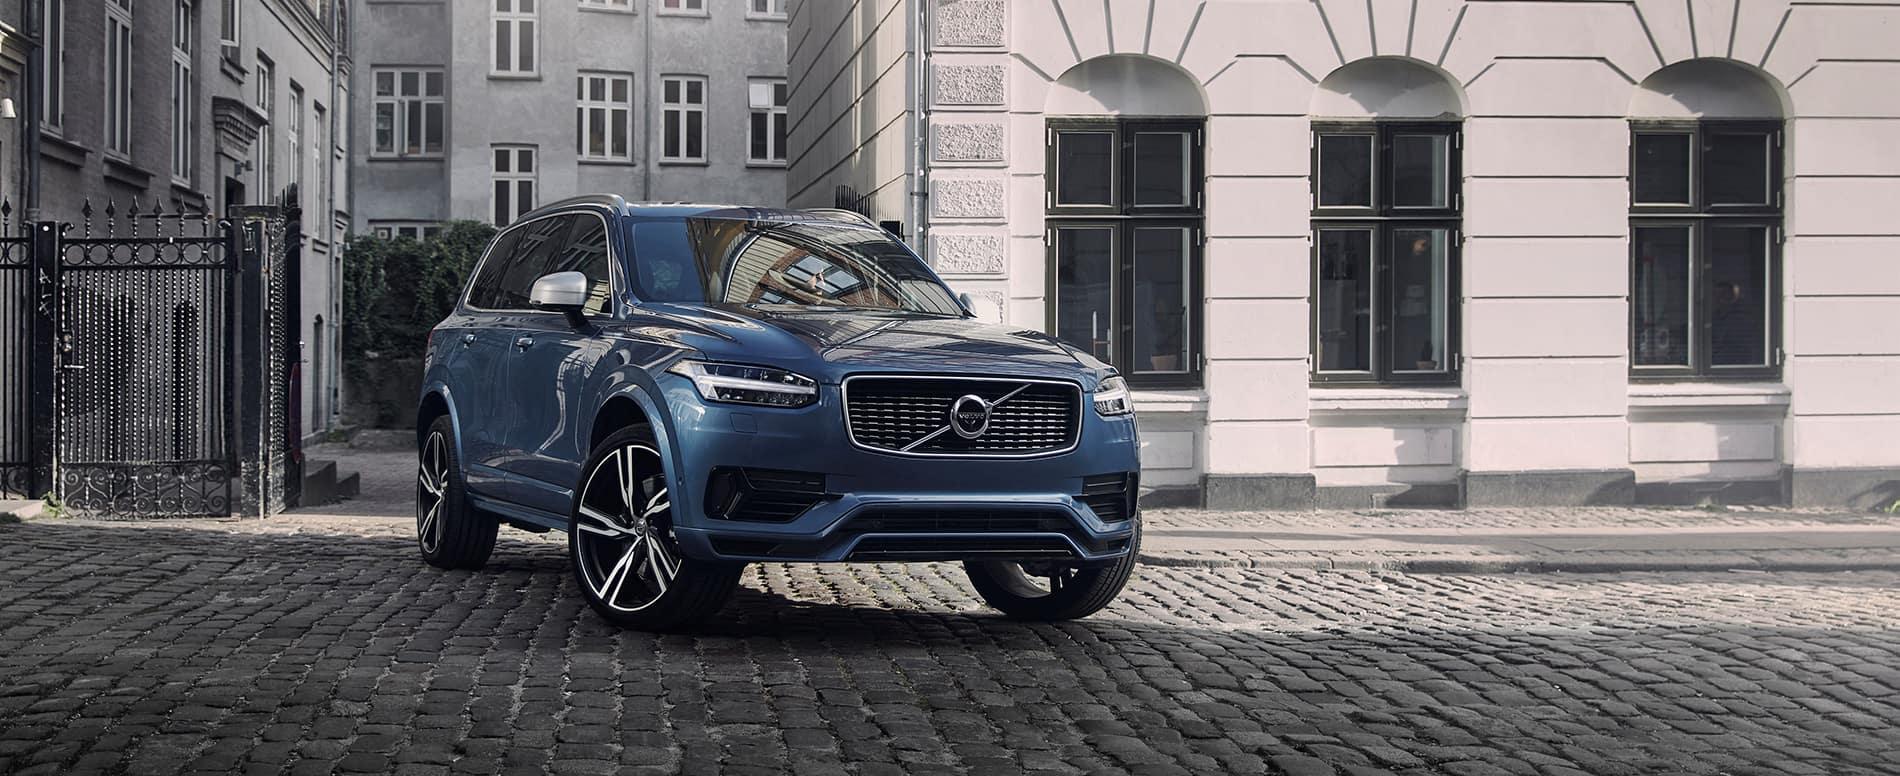 Autobahn Pre-Owned | CPO Volvos